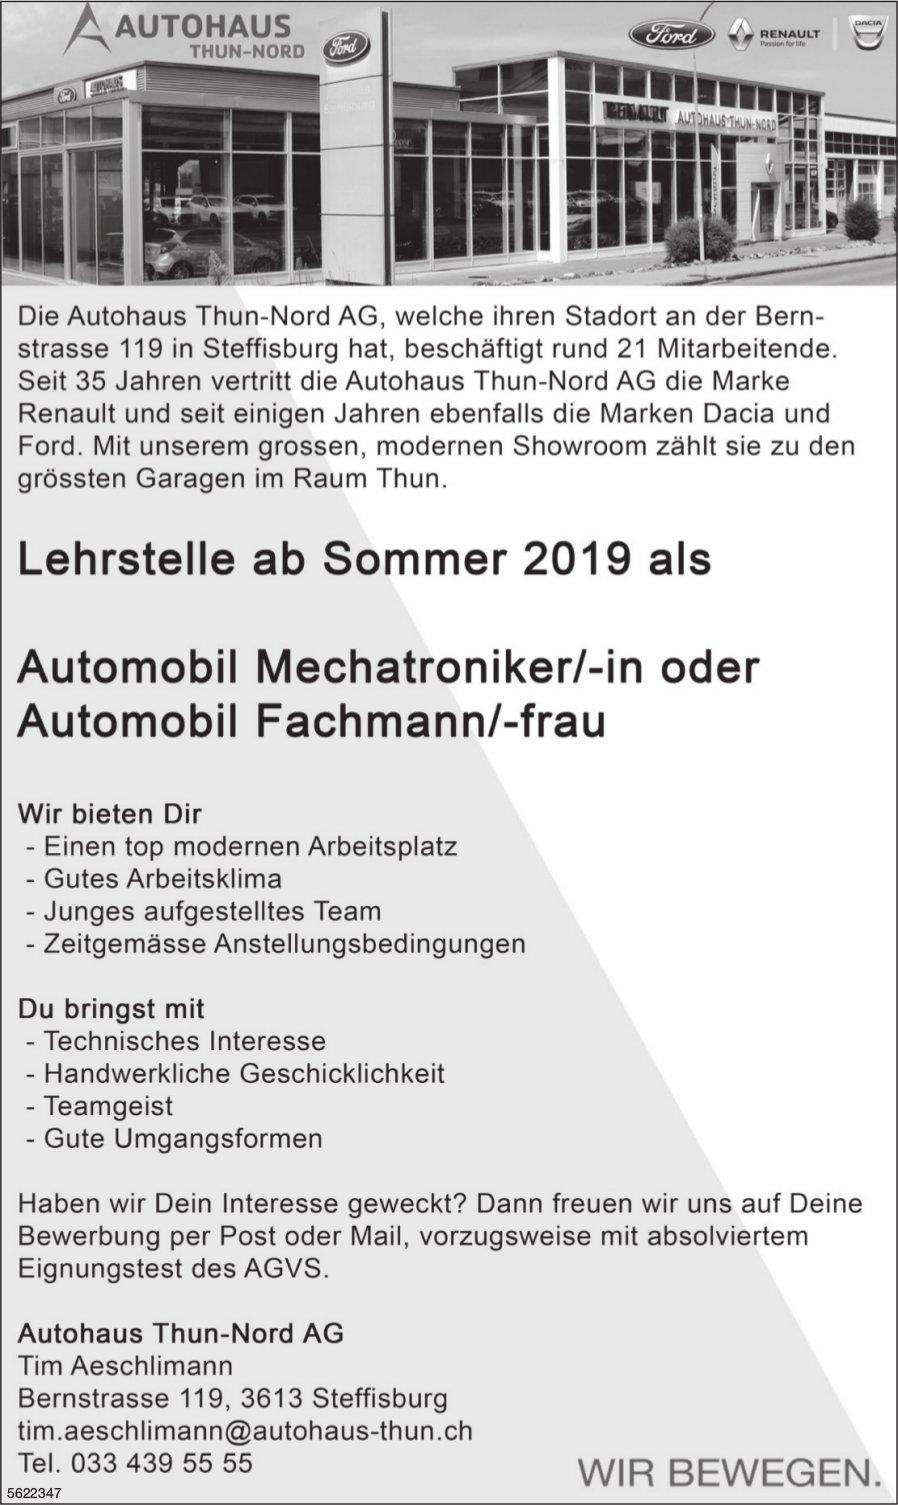 Lehrstelle als Automobil Mechatroniker/-in oder Automobil Fachmann/-frau, Autohaus Thun-Nord AG